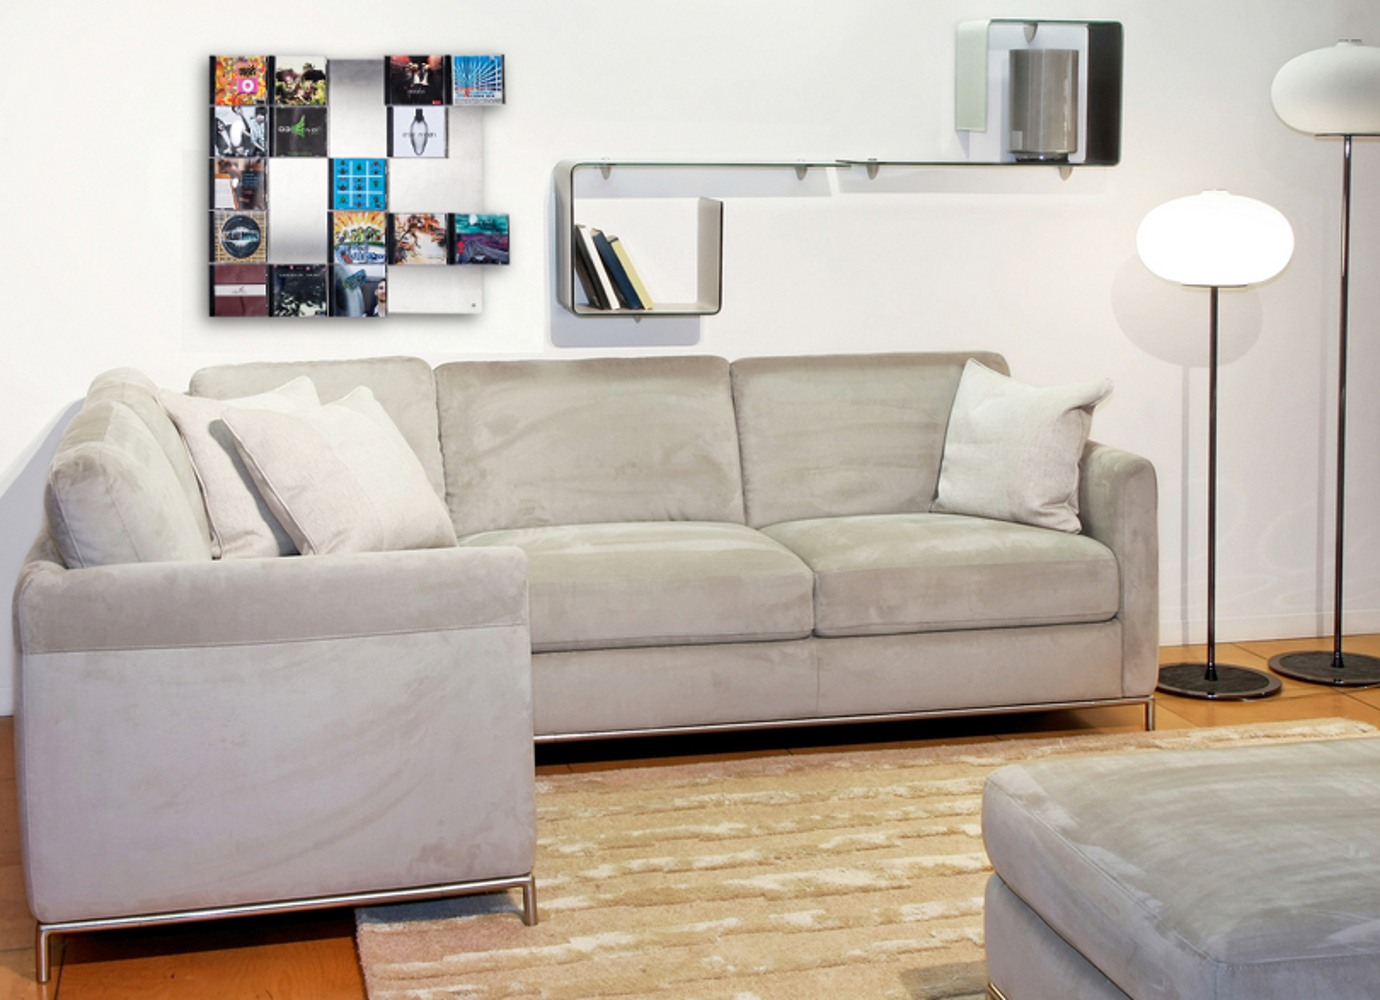 Cd wandbild als dekorative wohnidee nur bei cd wall - Dekorative wohnidee ...